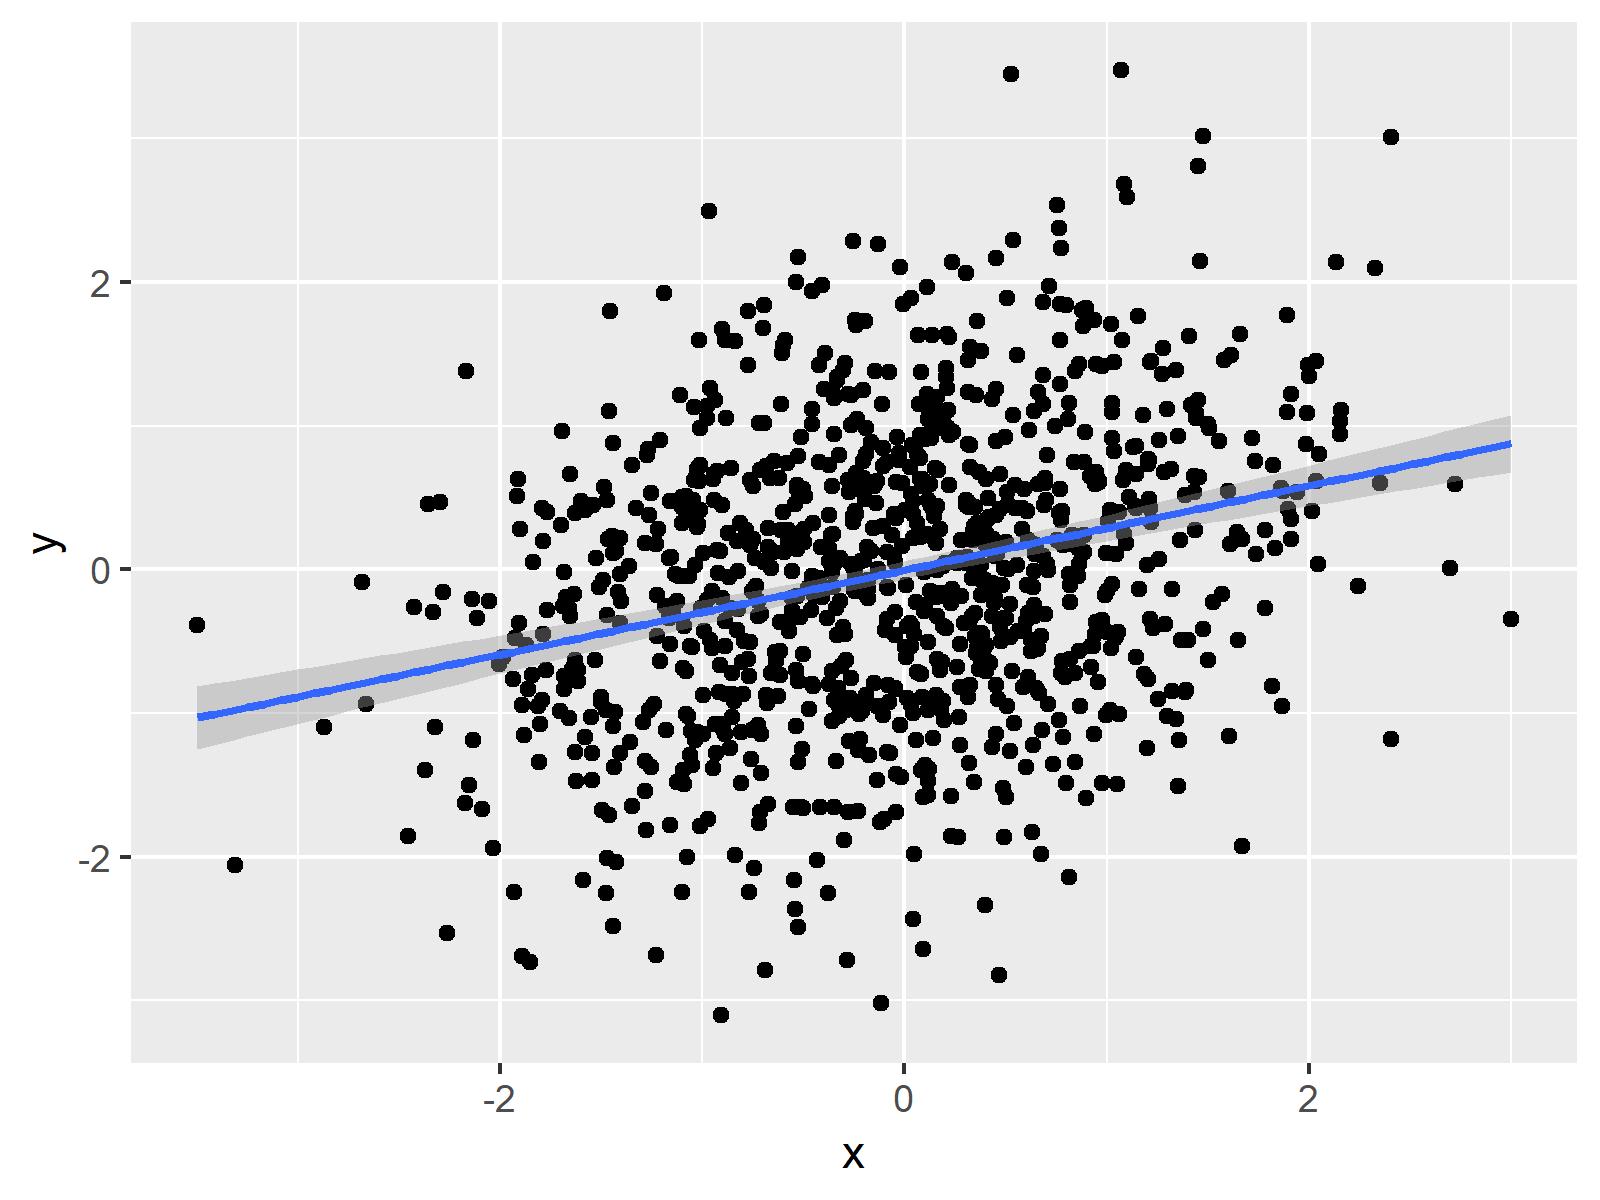 Dotplot ggplot2 R with Regression Line